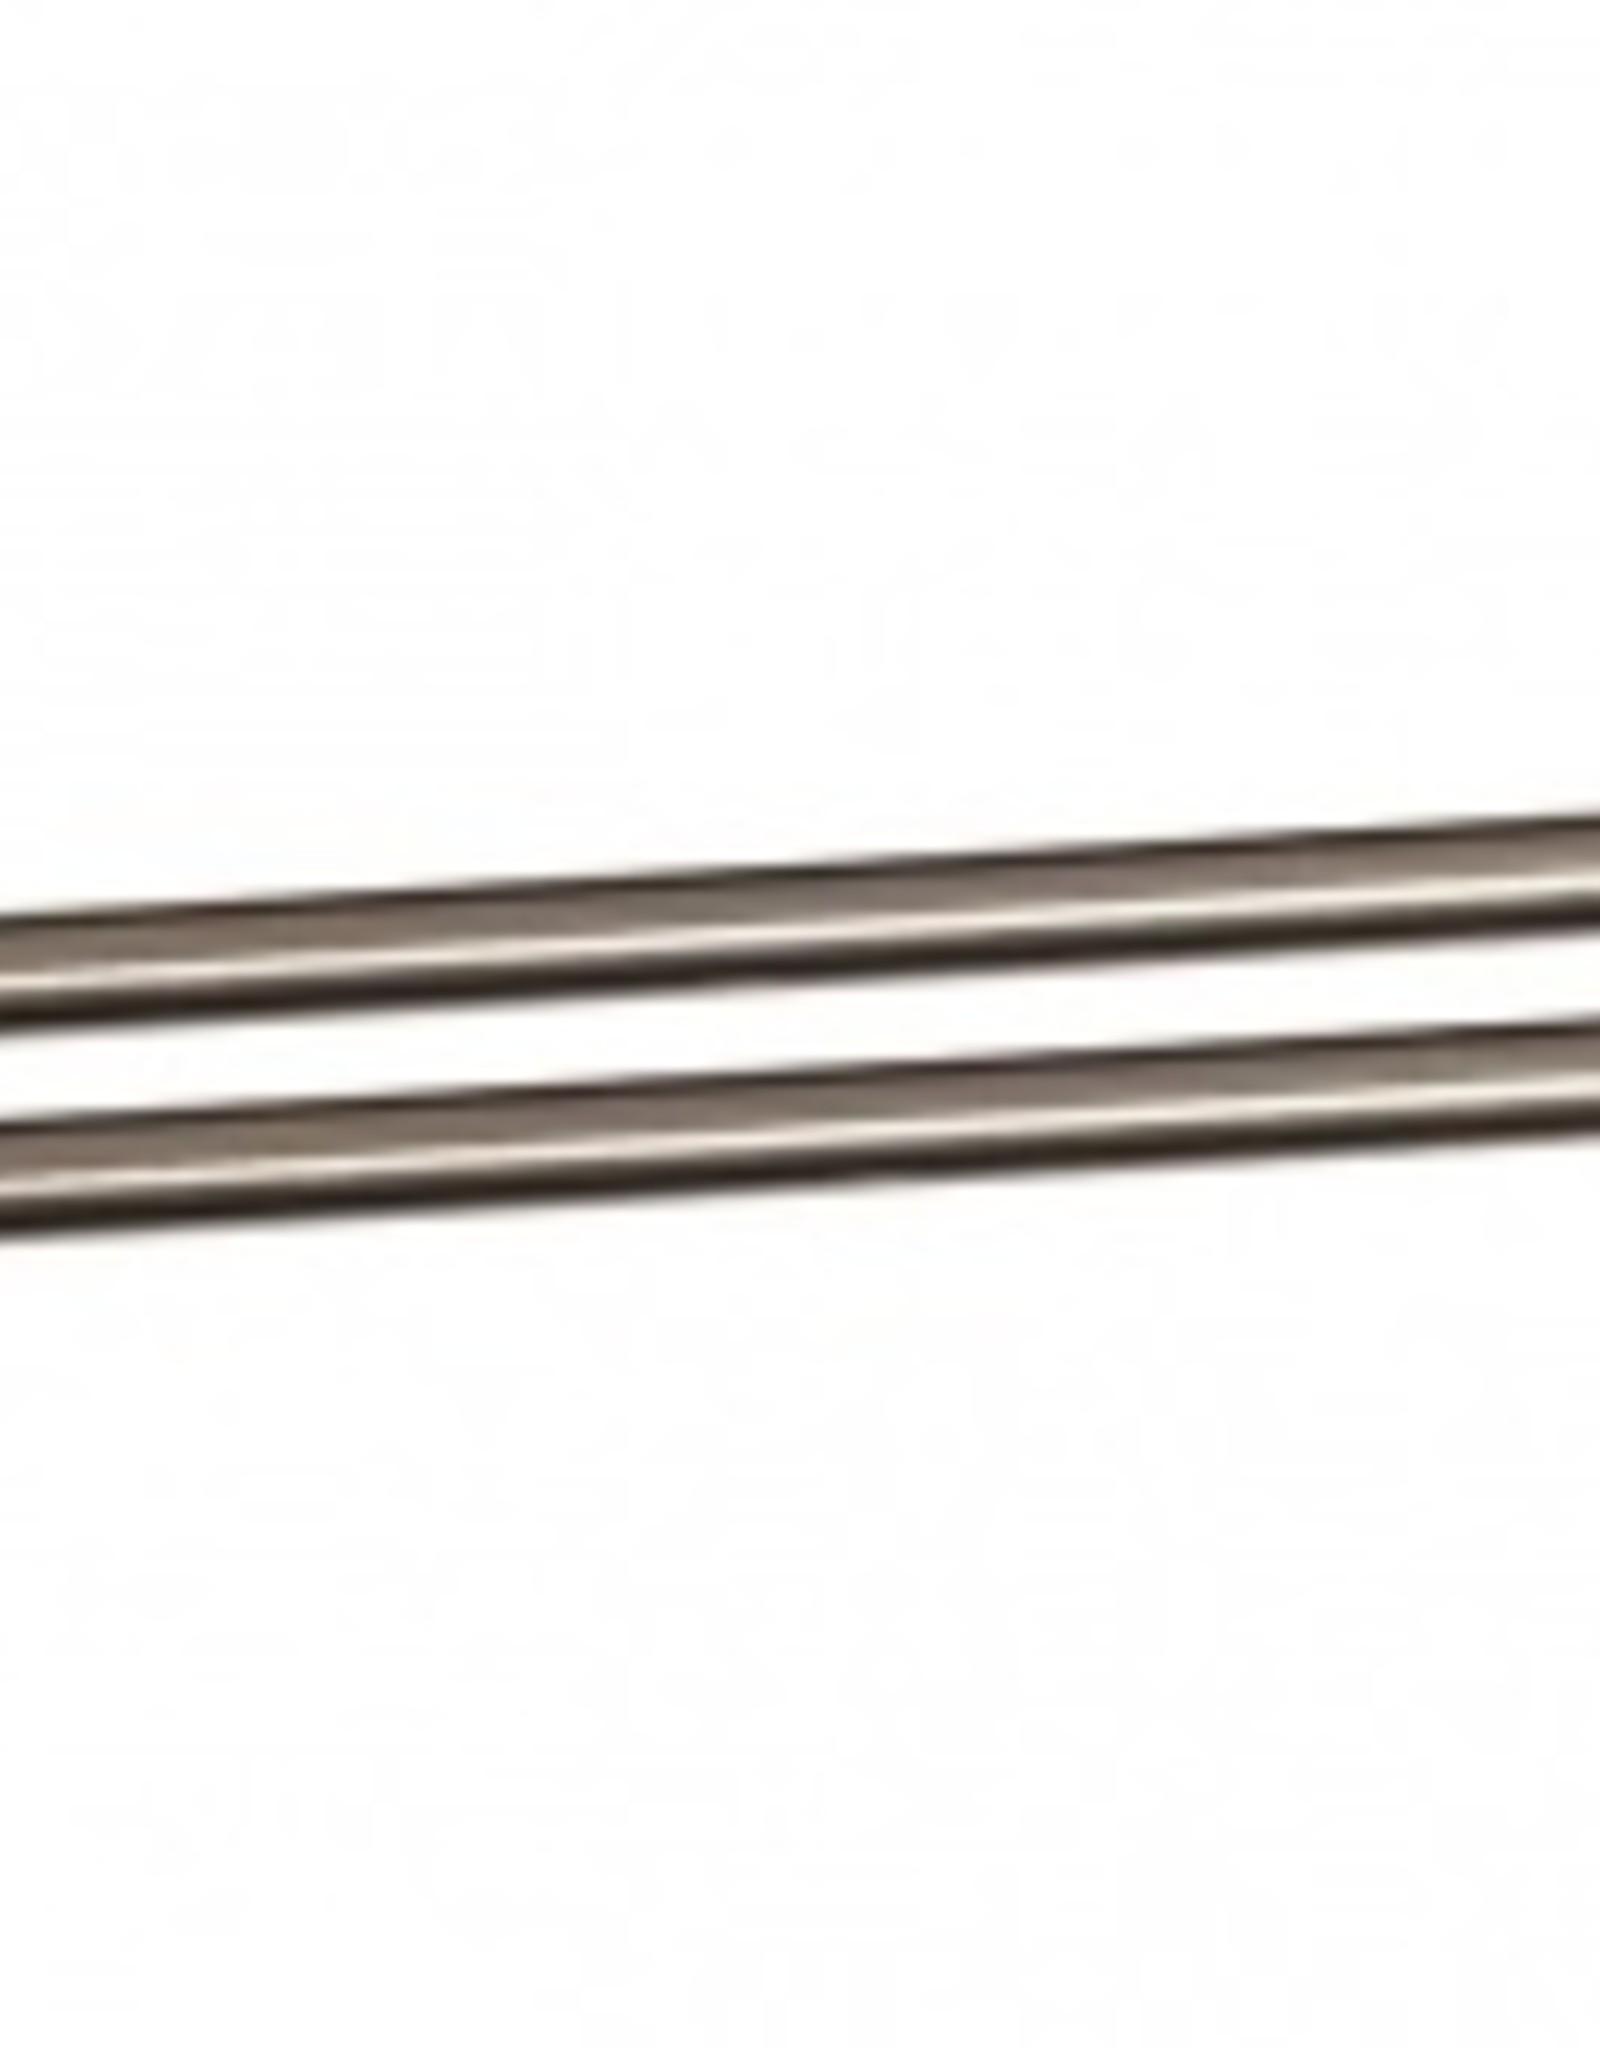 Traxxas Traxxas X-Maxx Suspension pins, 4x85mm (hardened steel) (2)